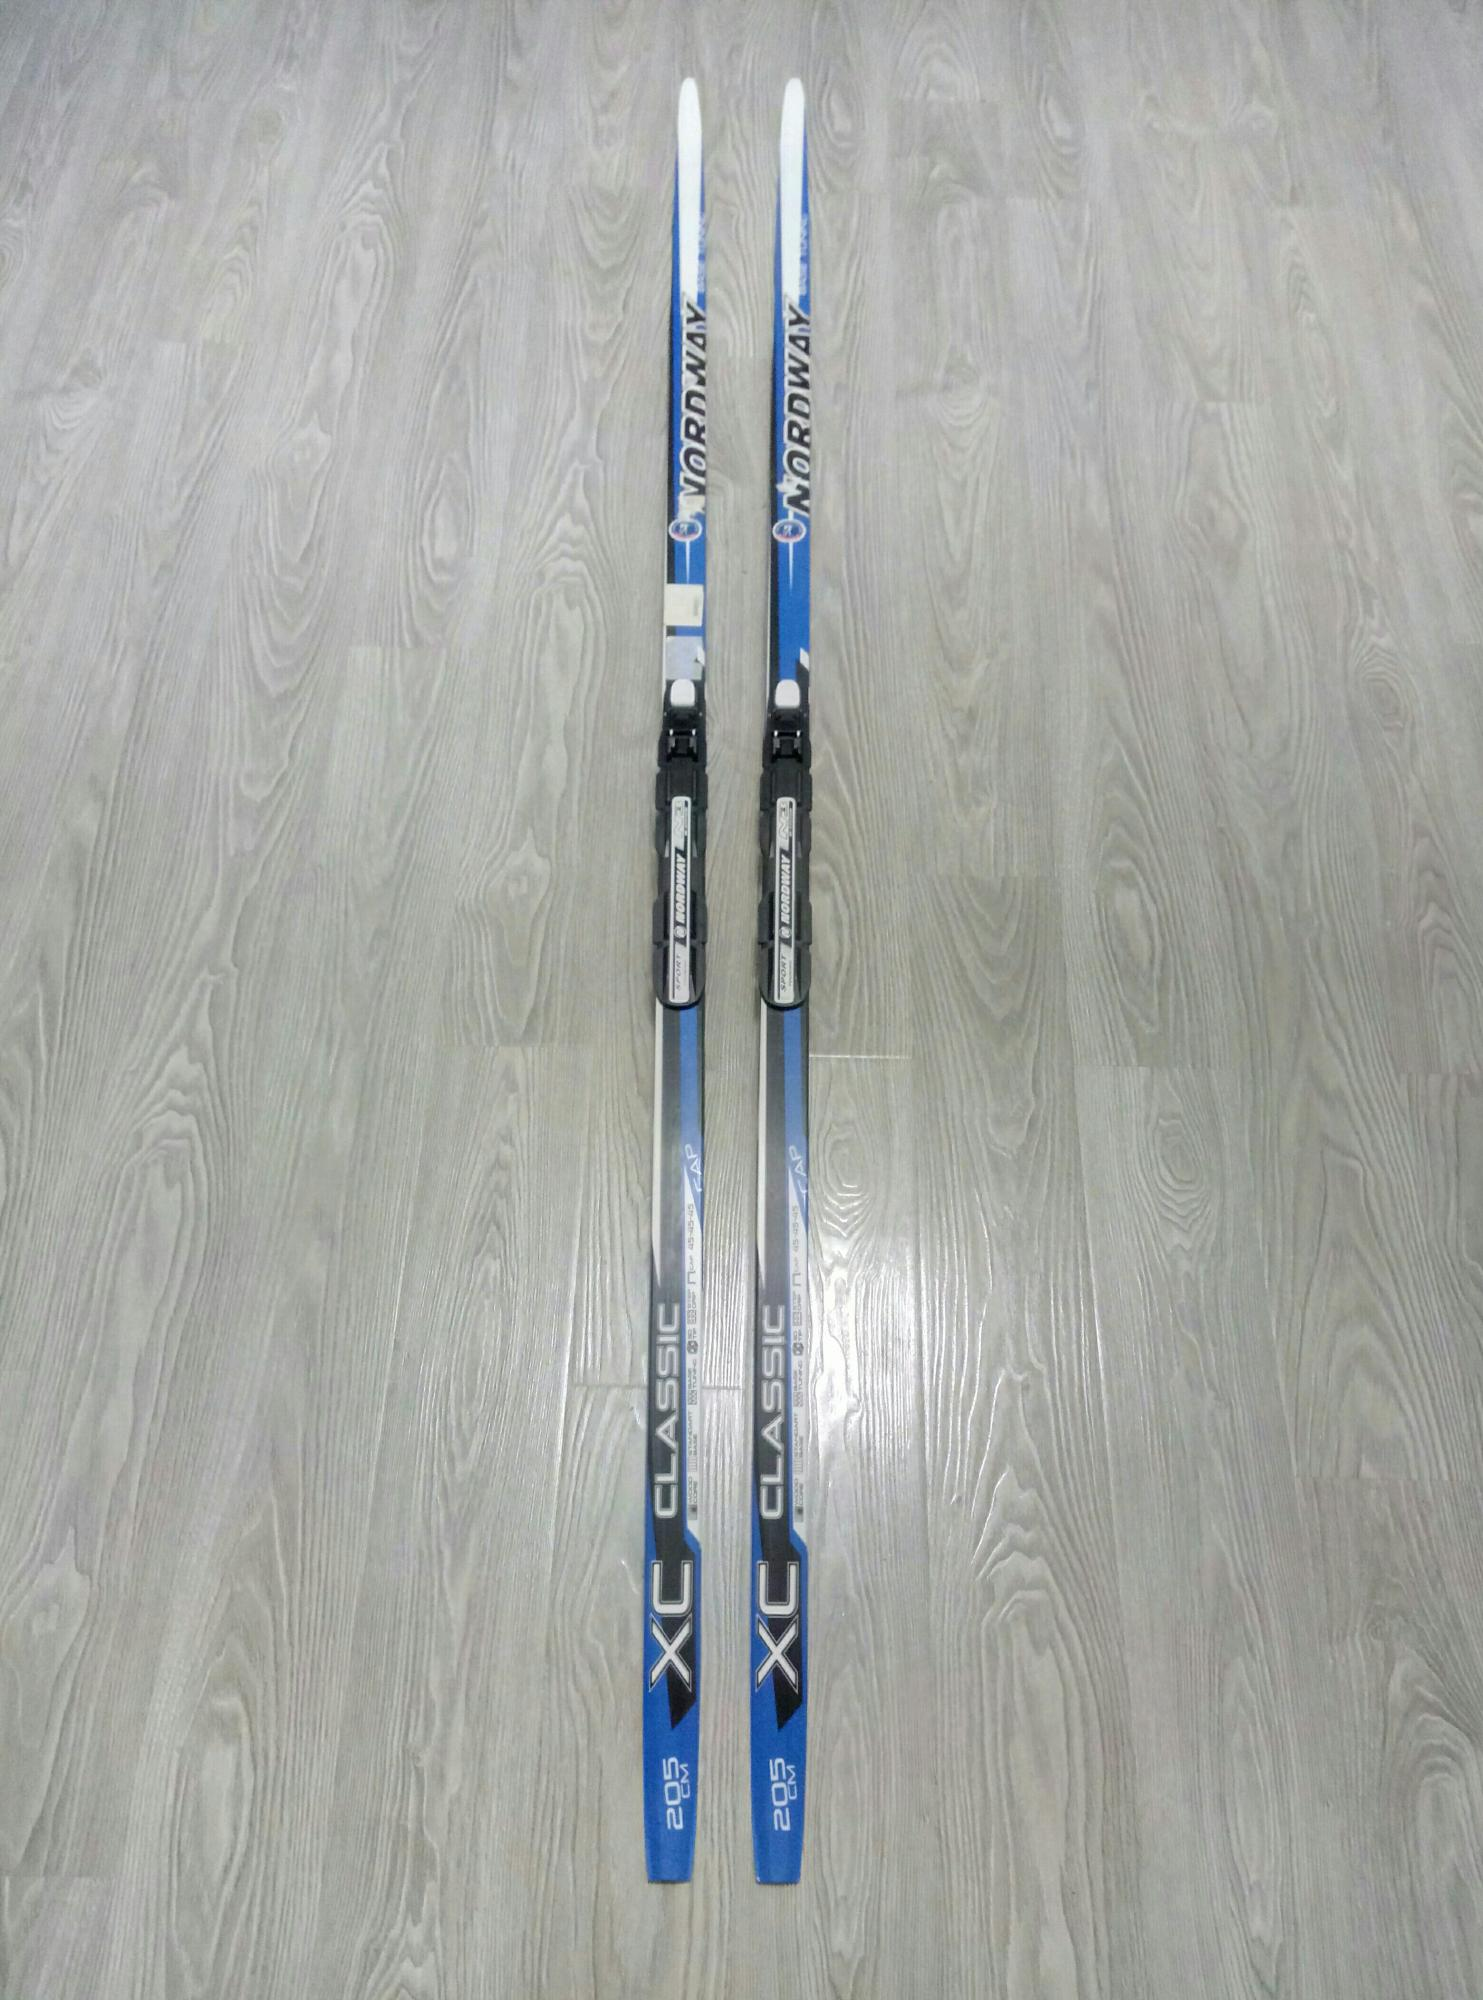 синие лыжи фото этот